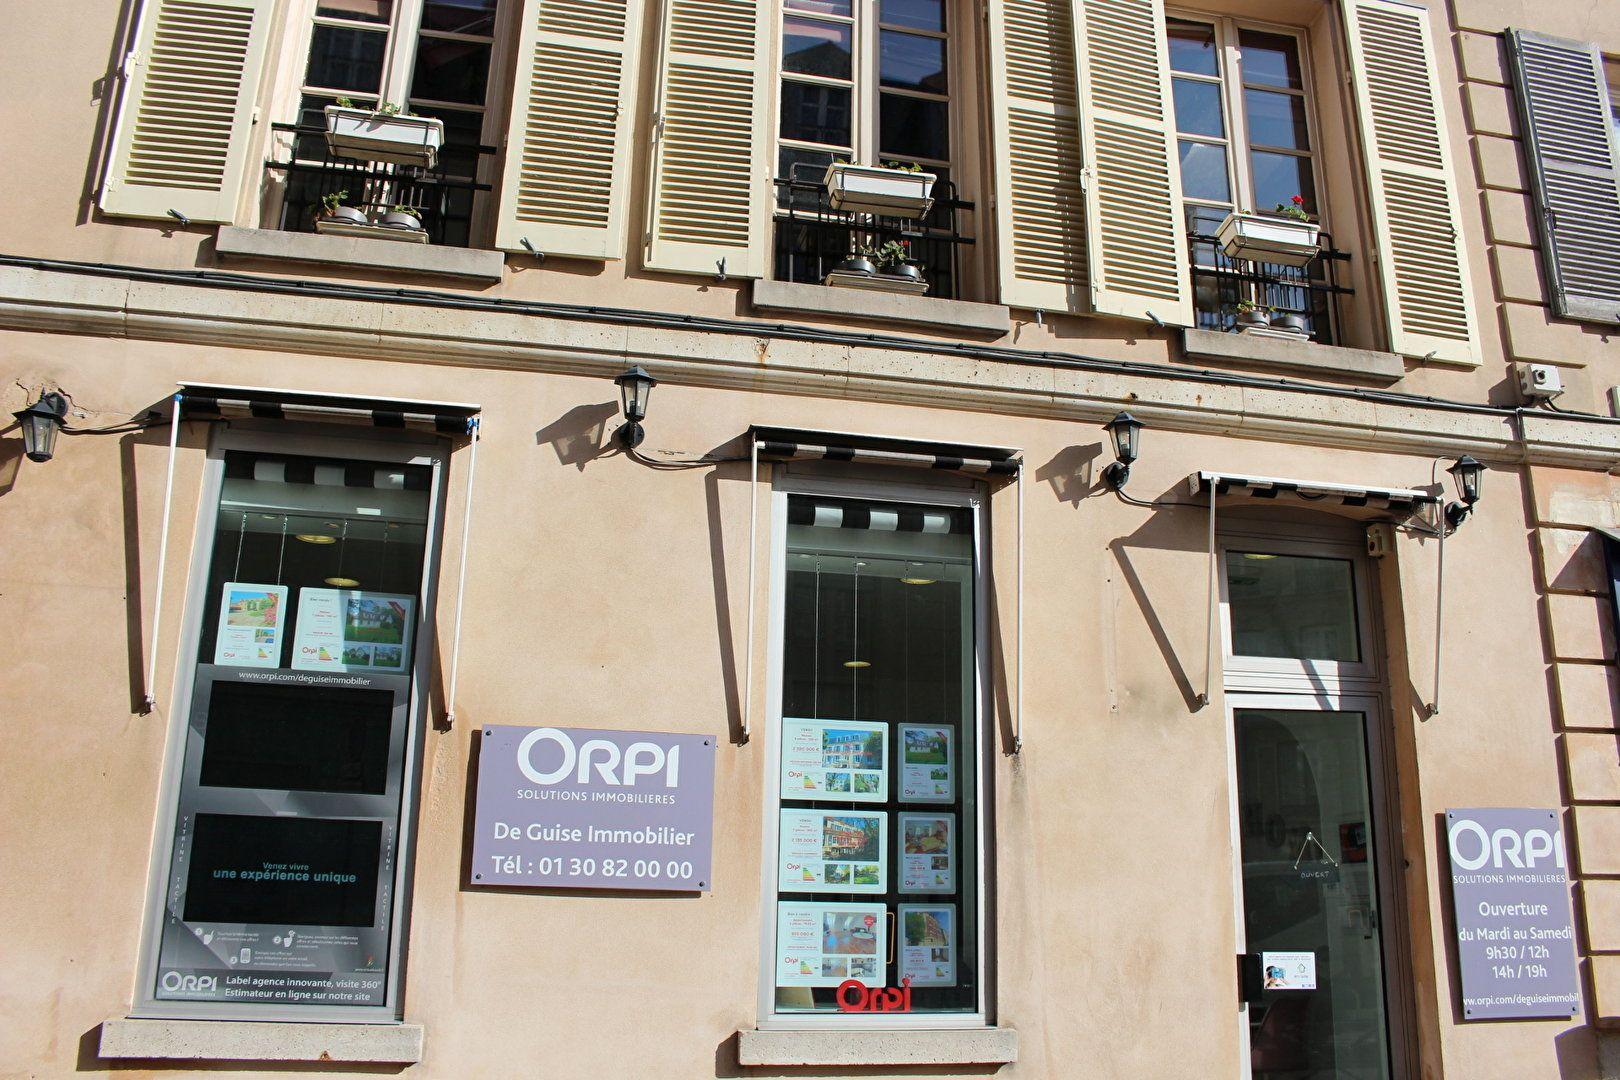 Orpi De Guise Immobilier